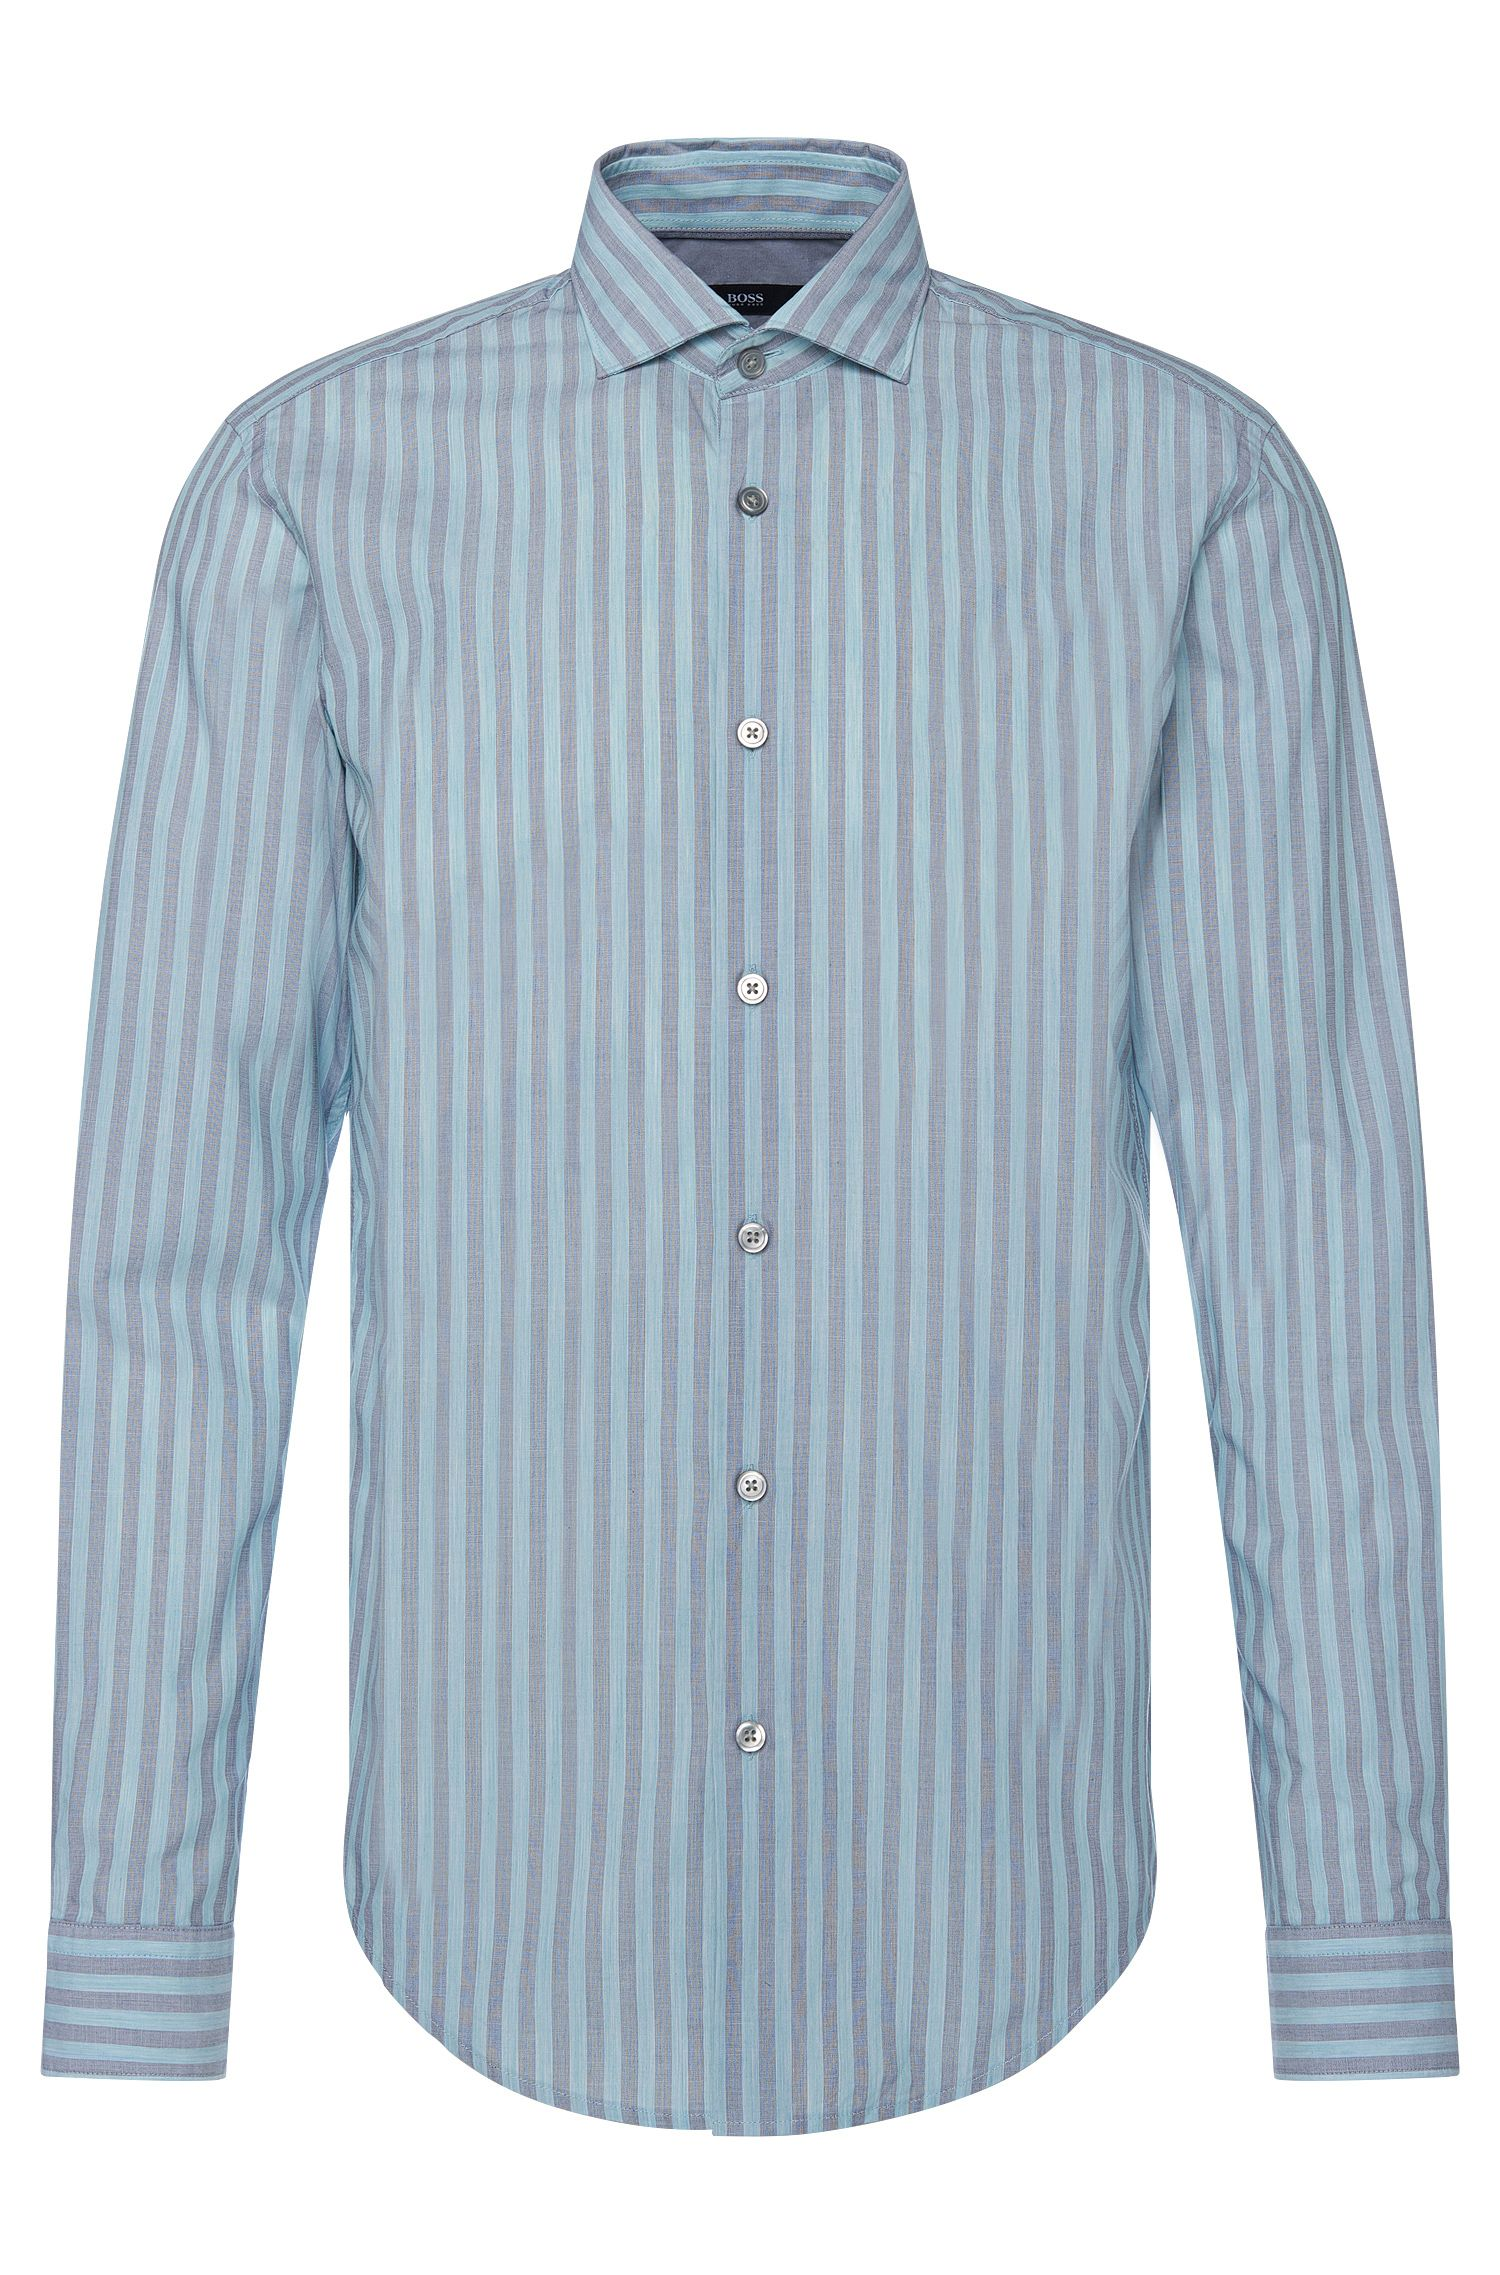 'Ridley' | Slim Fit, Cotton Striped Button Down Shirt